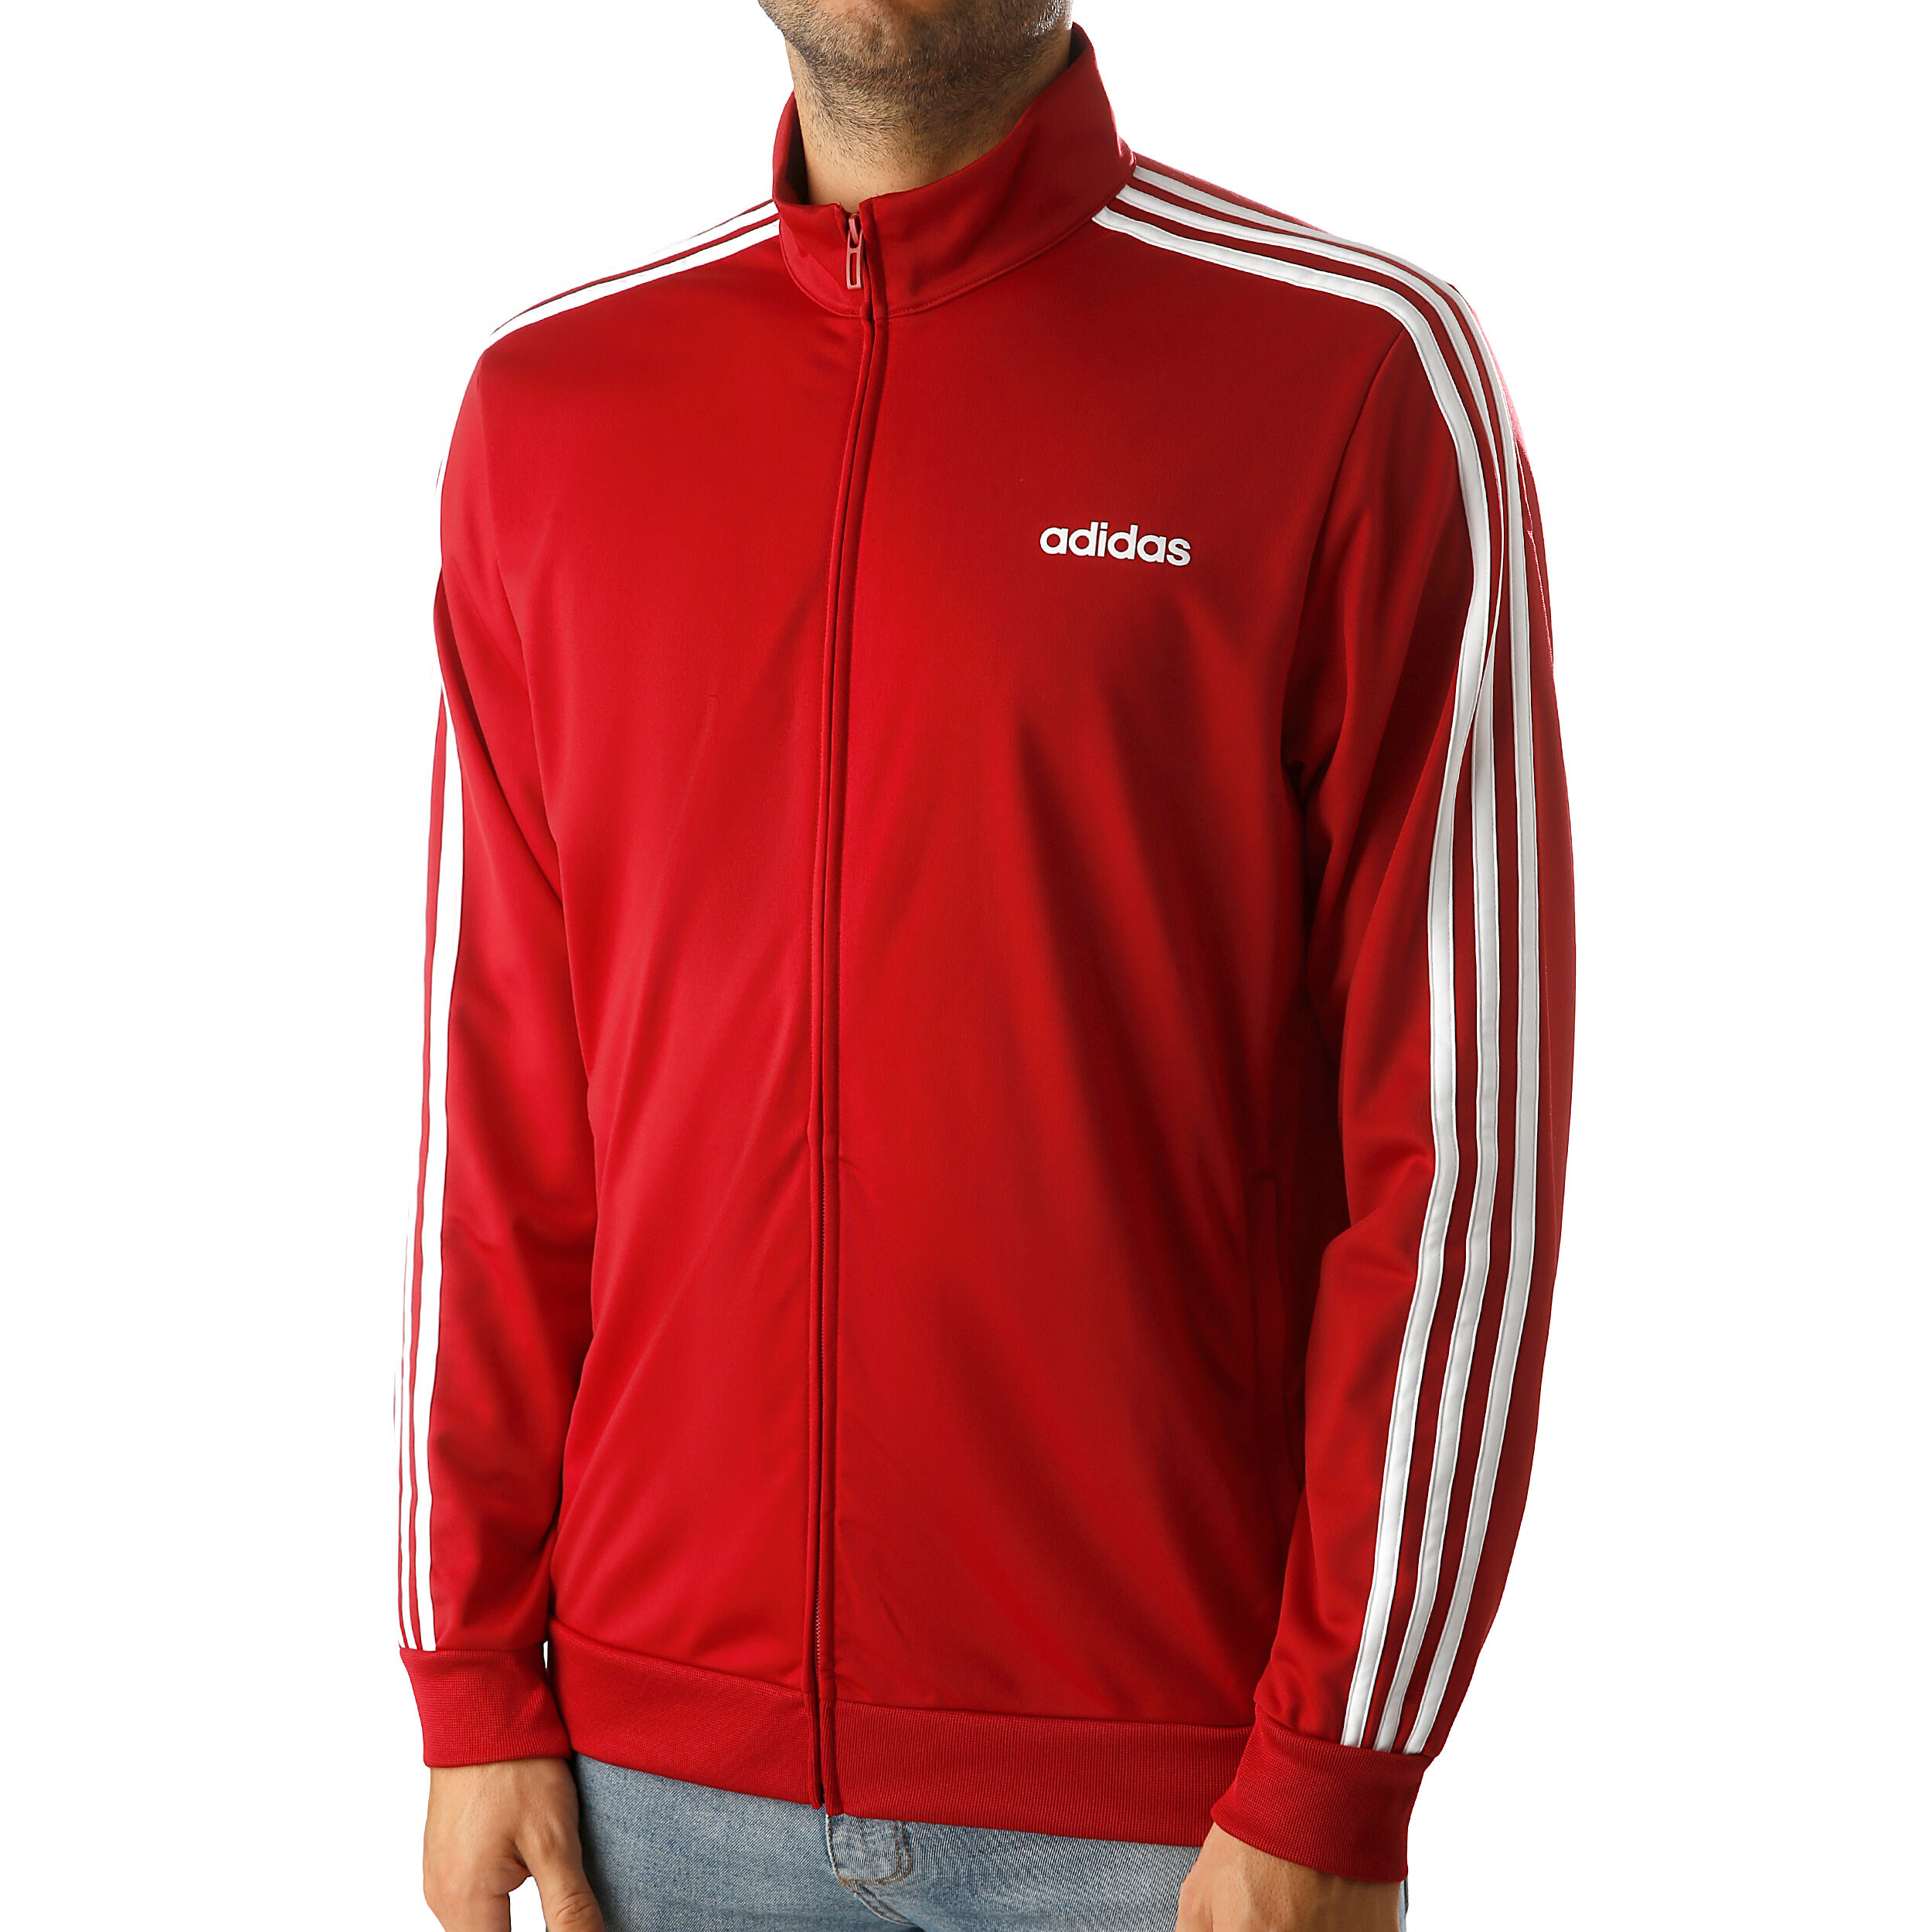 adidas Essentials 3 Stripes Tricot Track Jacket Burgundy